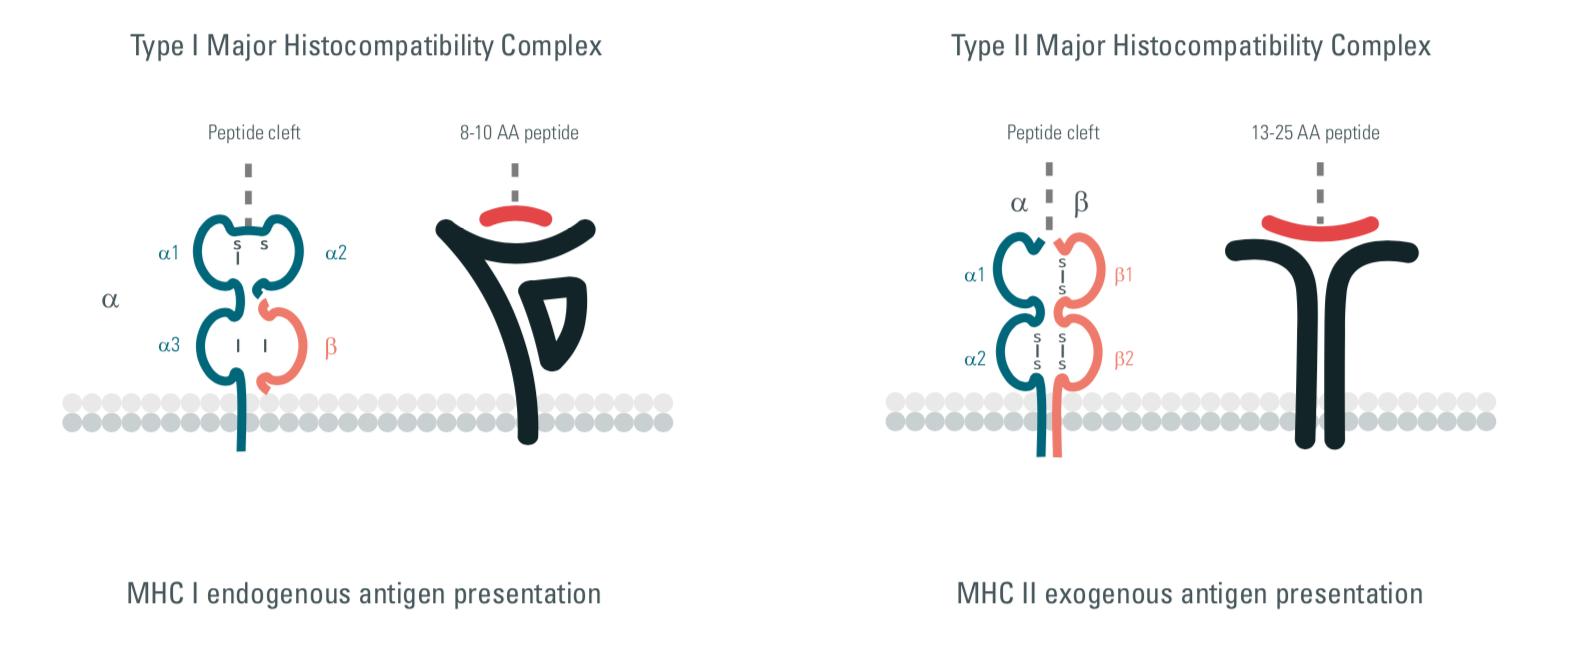 MHC, major histocompatibility complex, innate immunity, therapeutic strategies, cisbio copyright